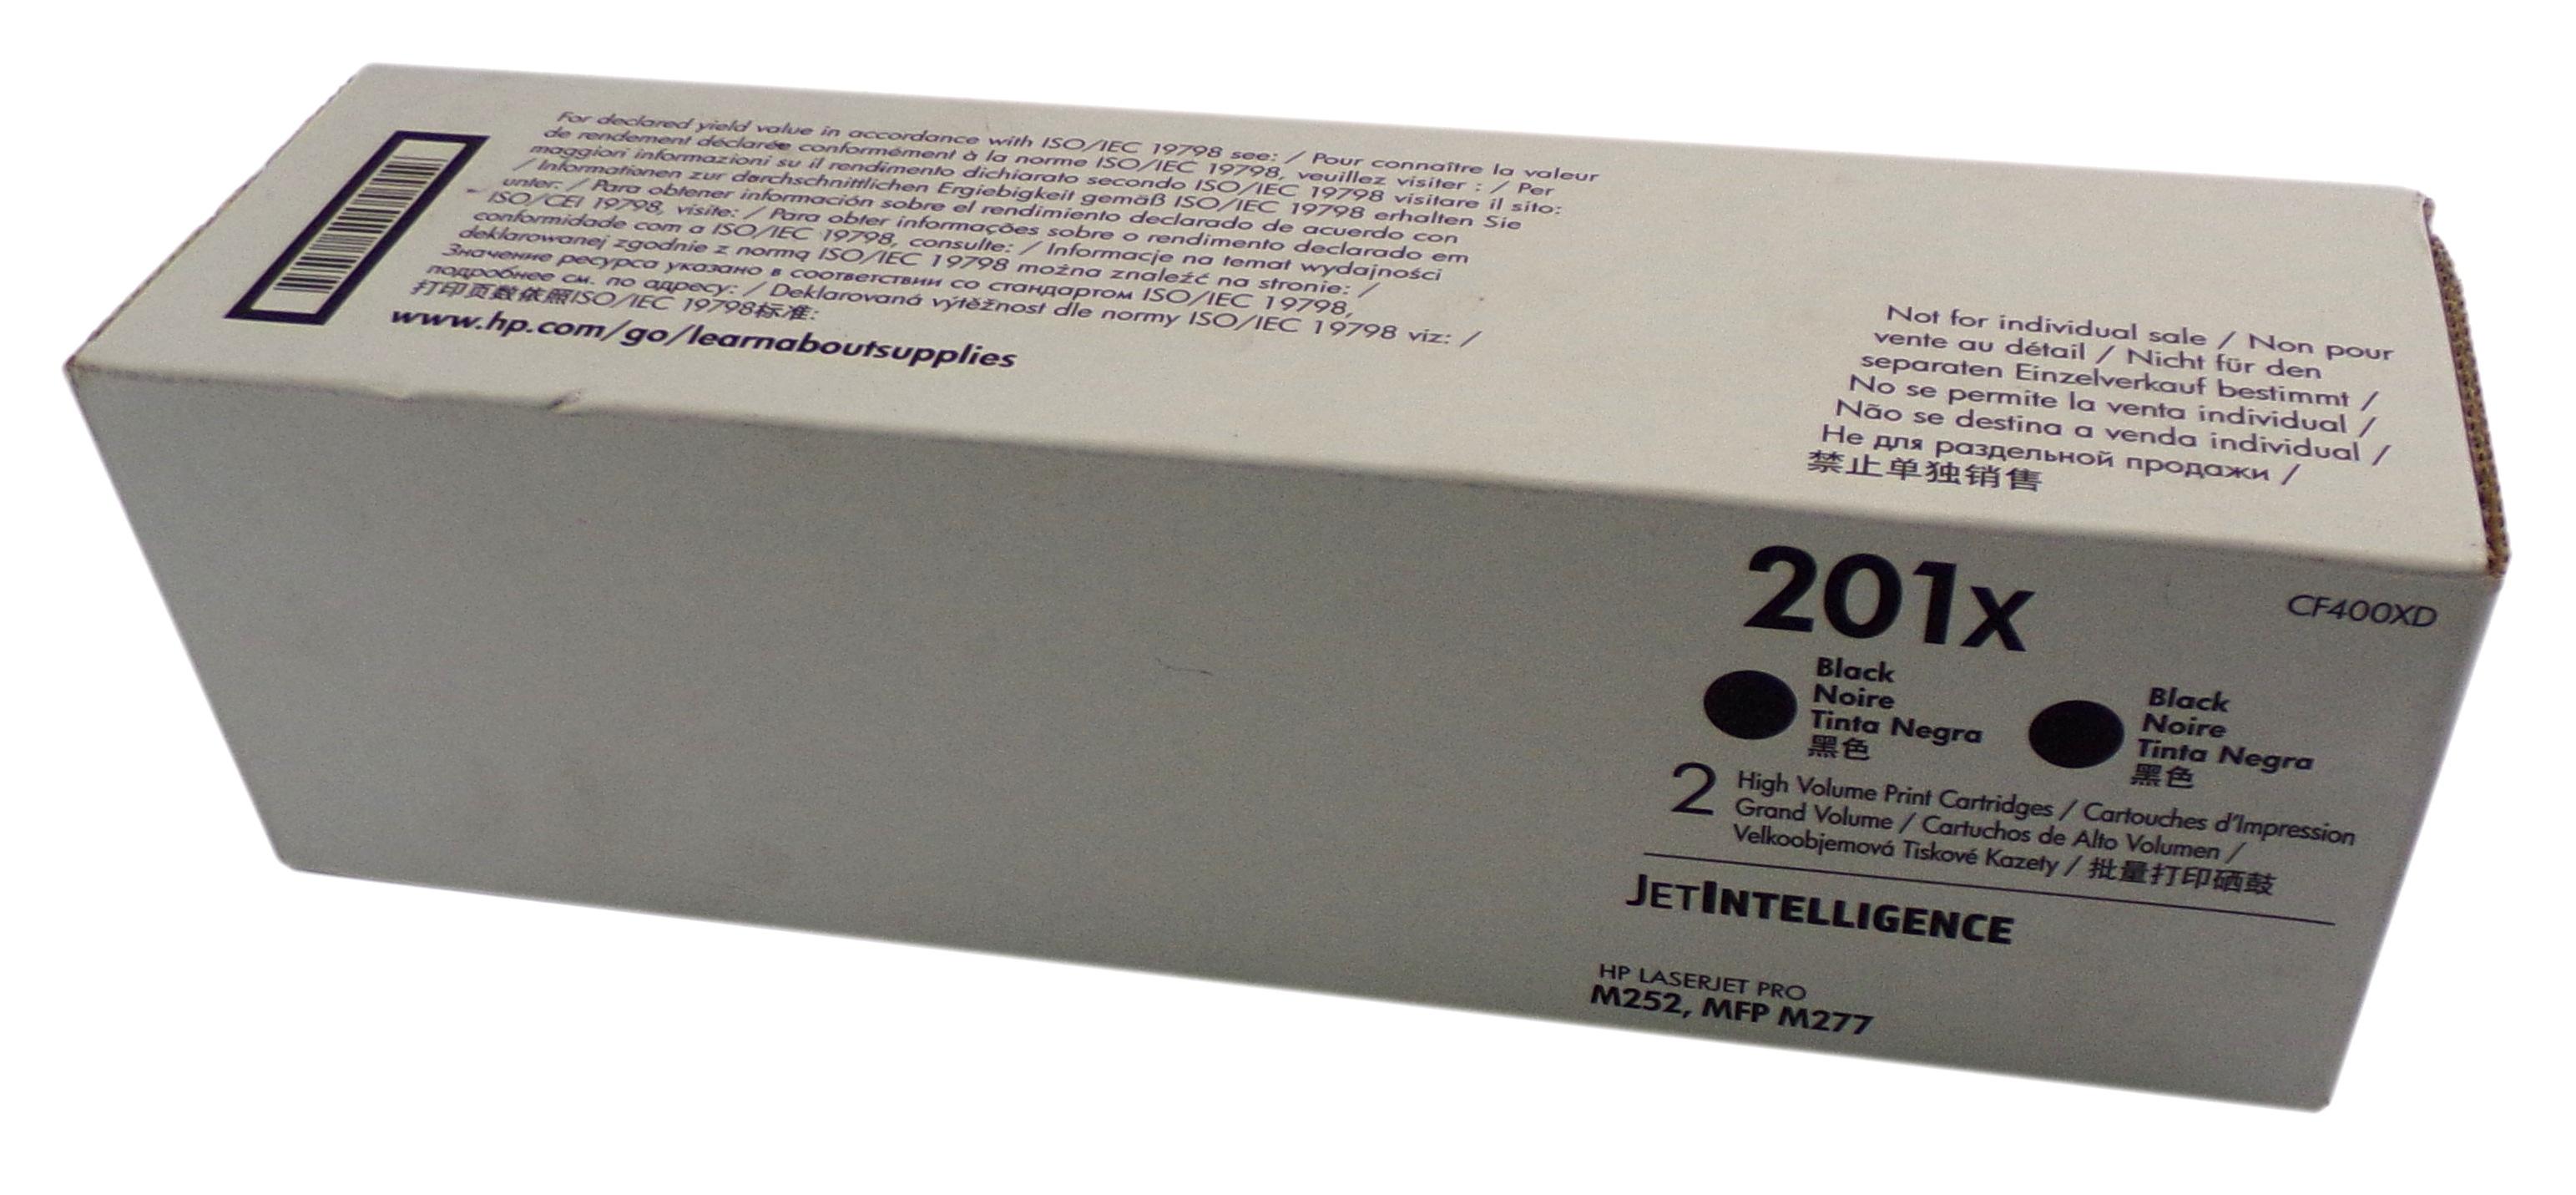 New Genuine HP JetIntelligence **SINGLE** CF400XD Print Cartridge 201x